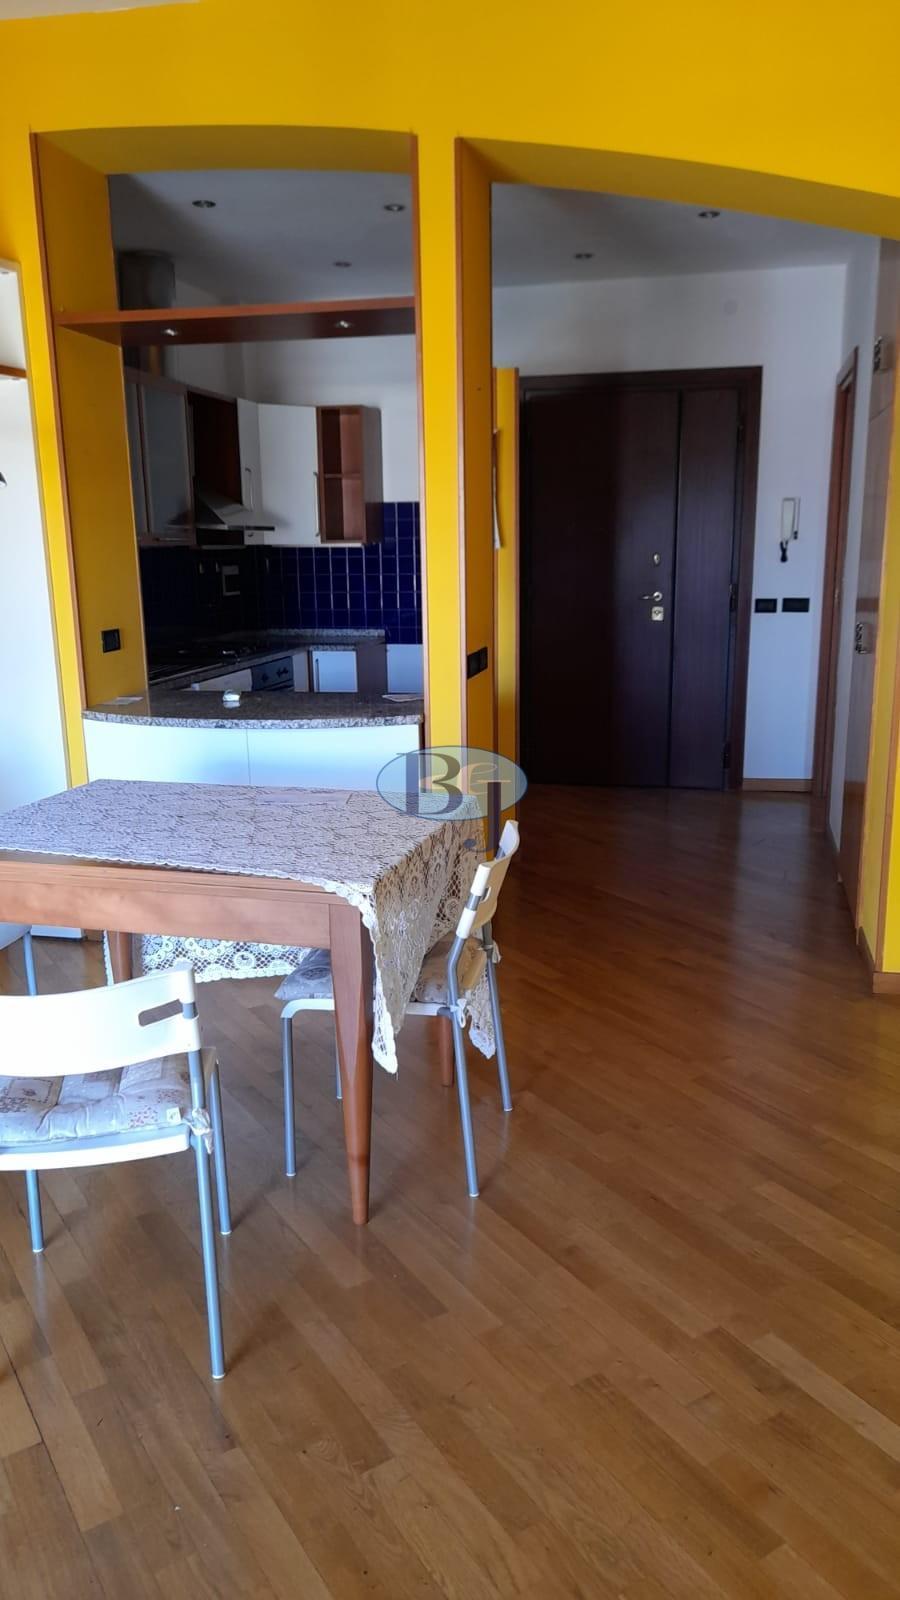 Appartamento a Firenze